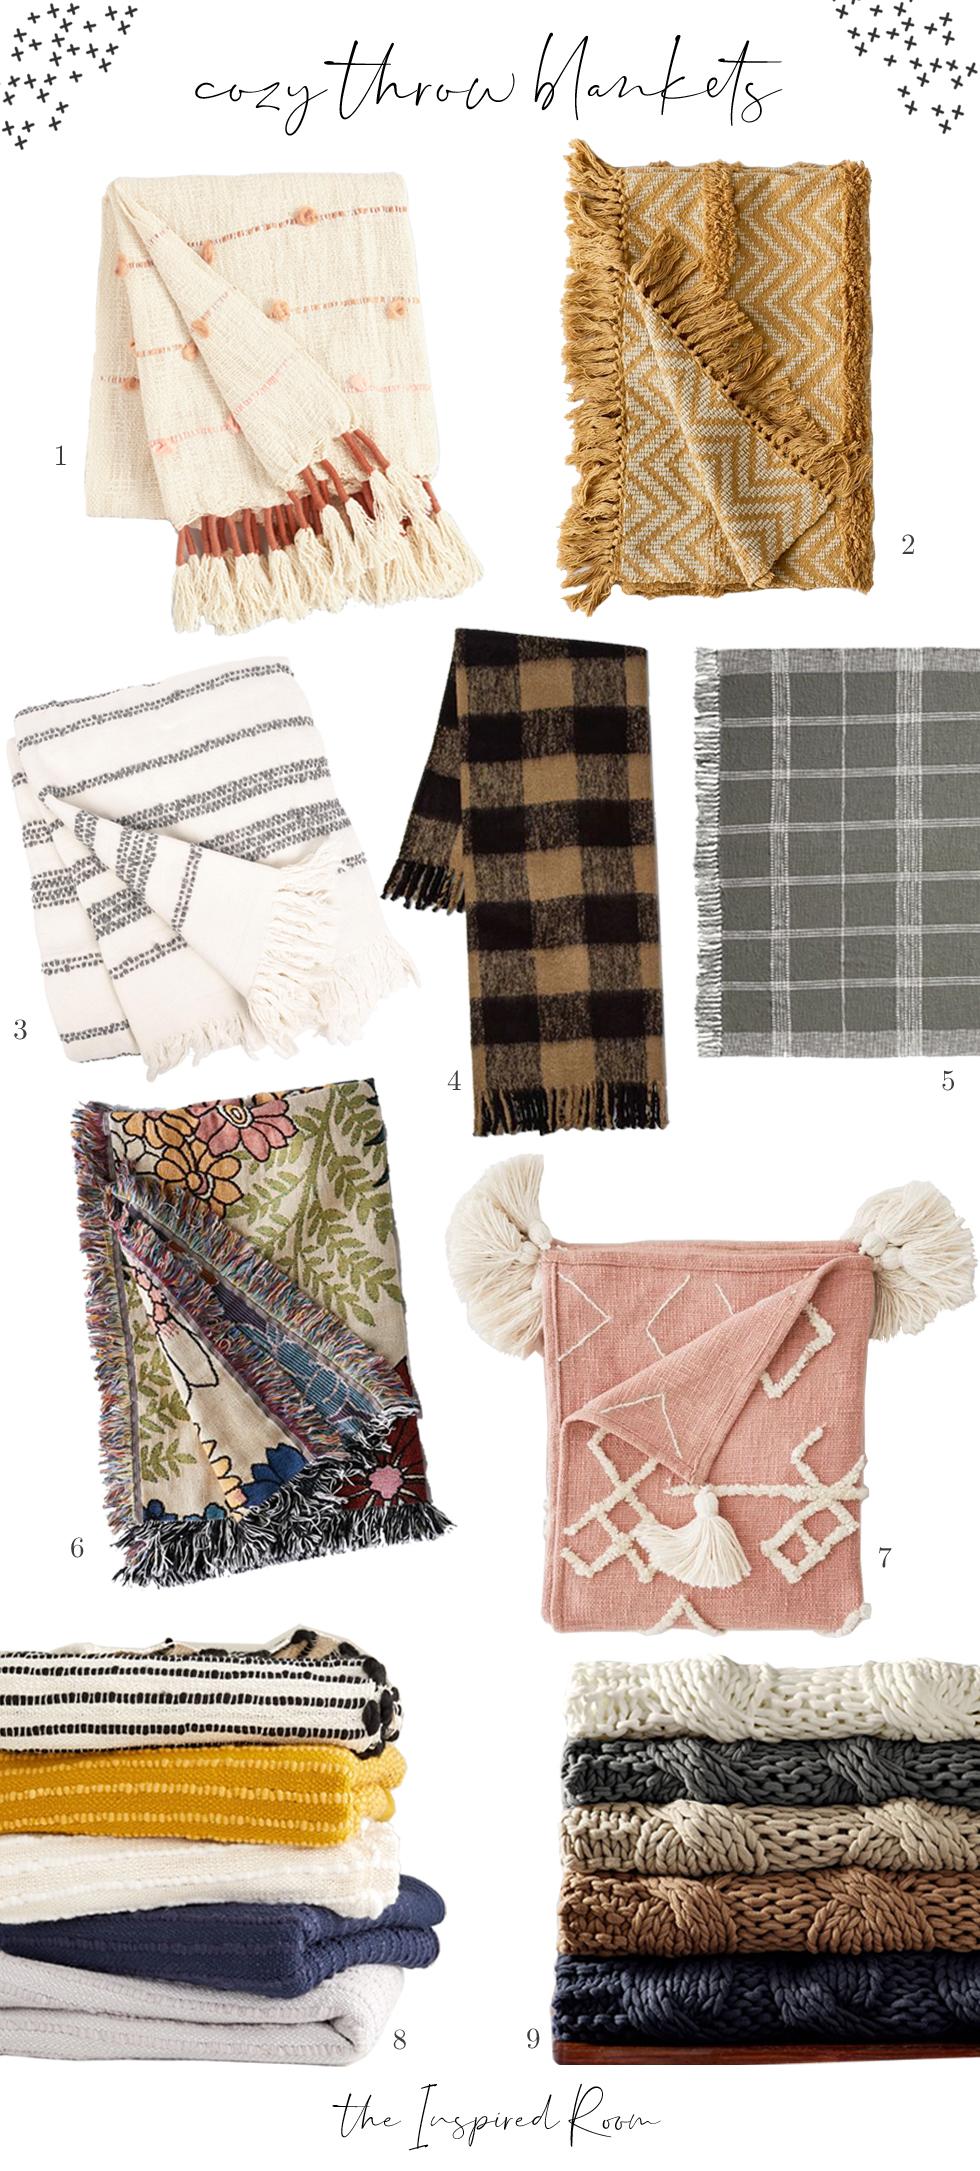 Cozy Throw Blankets (+ Cozy Fall Decor Shop)